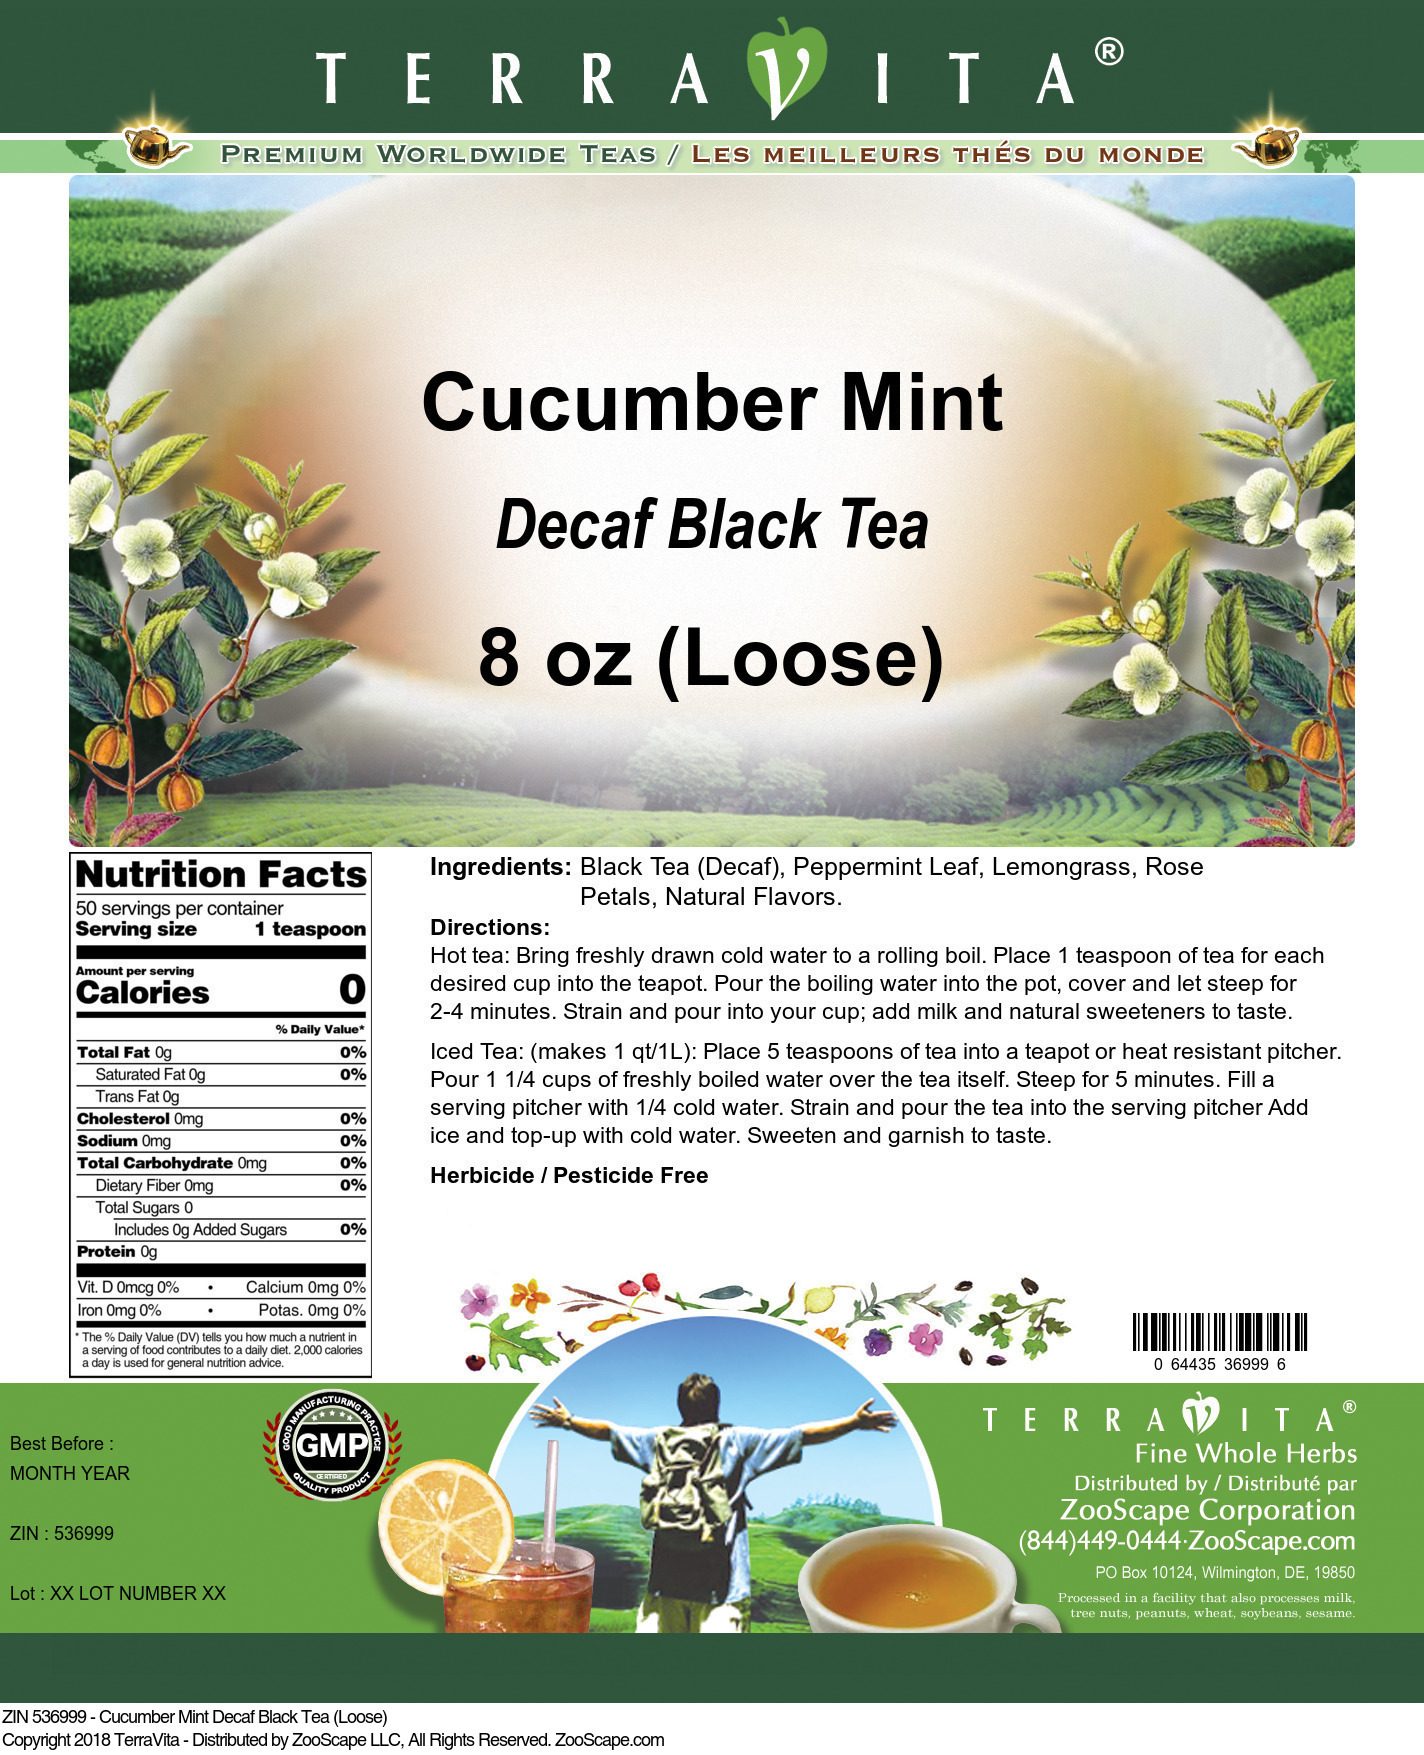 Cucumber Mint Decaf Black Tea (Loose)